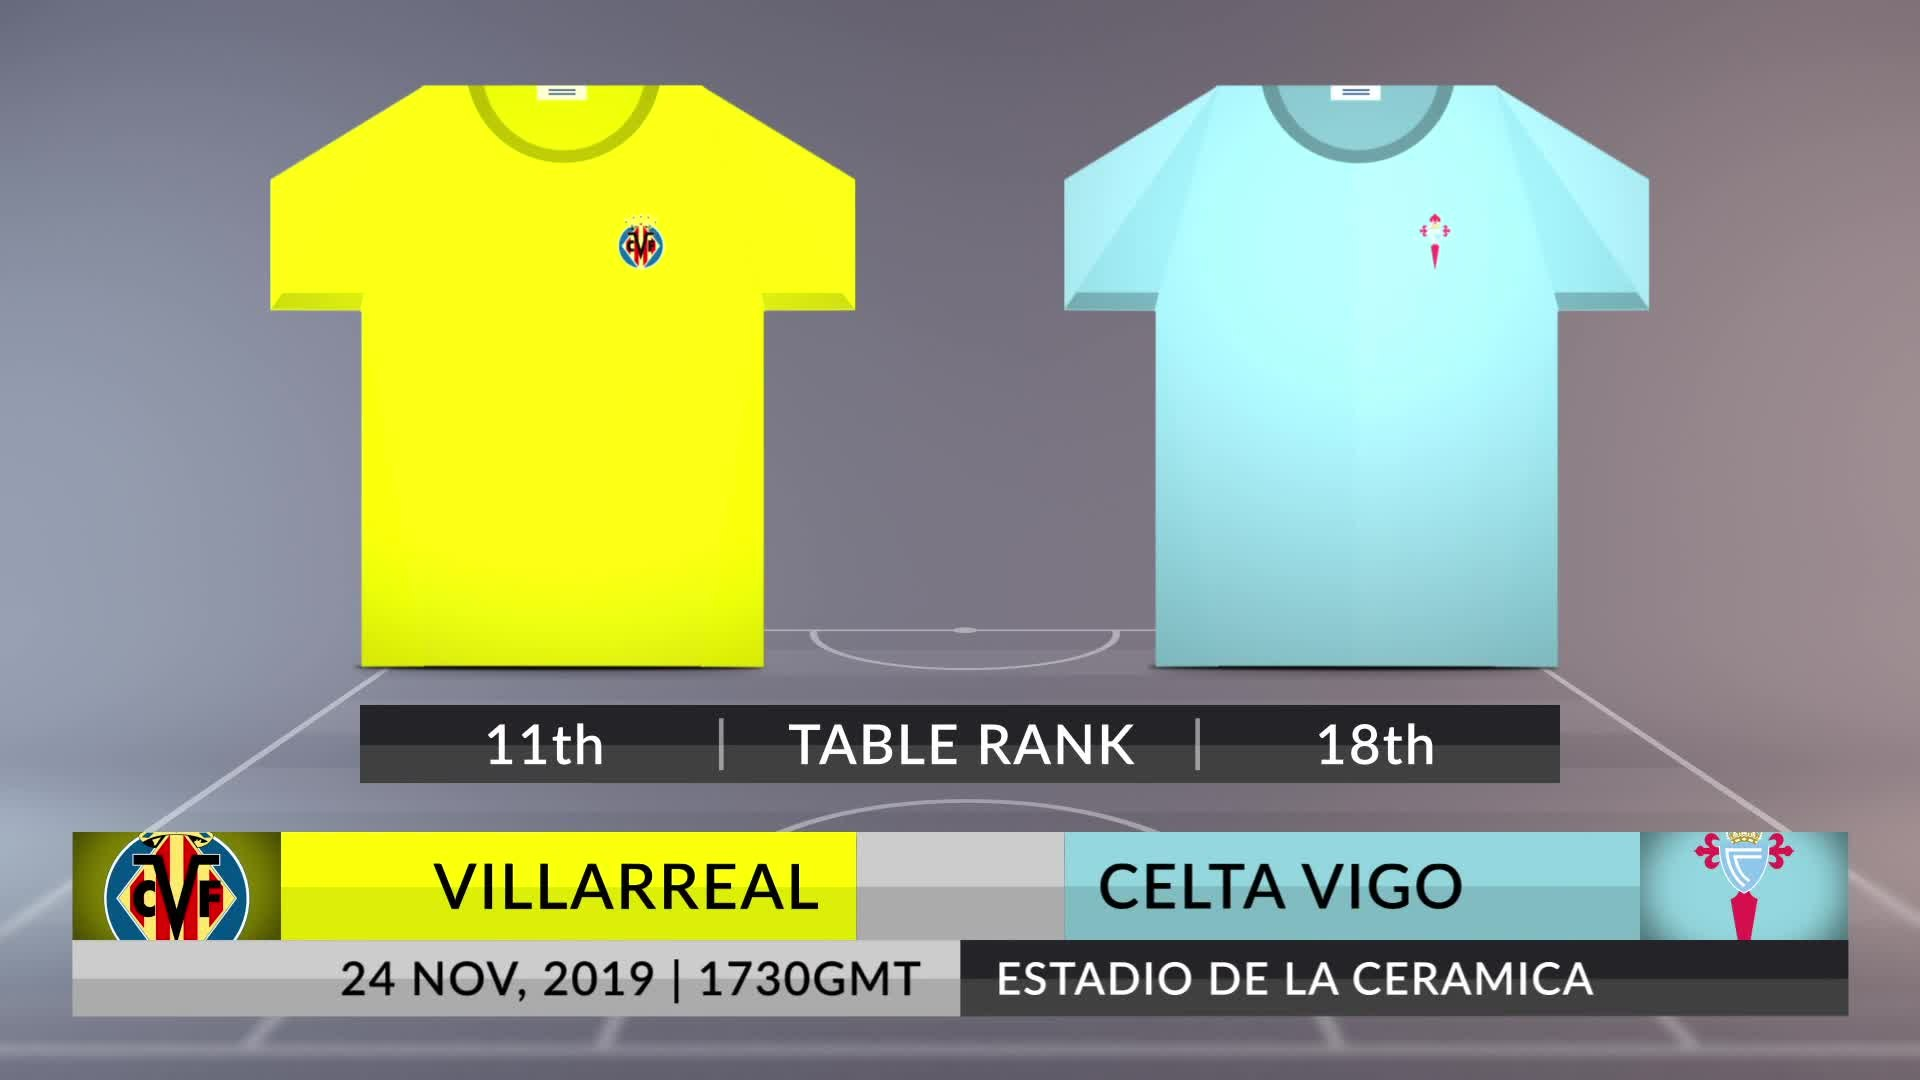 Match Preview: Villarreal vs Celta Vigo on 24/11/2019